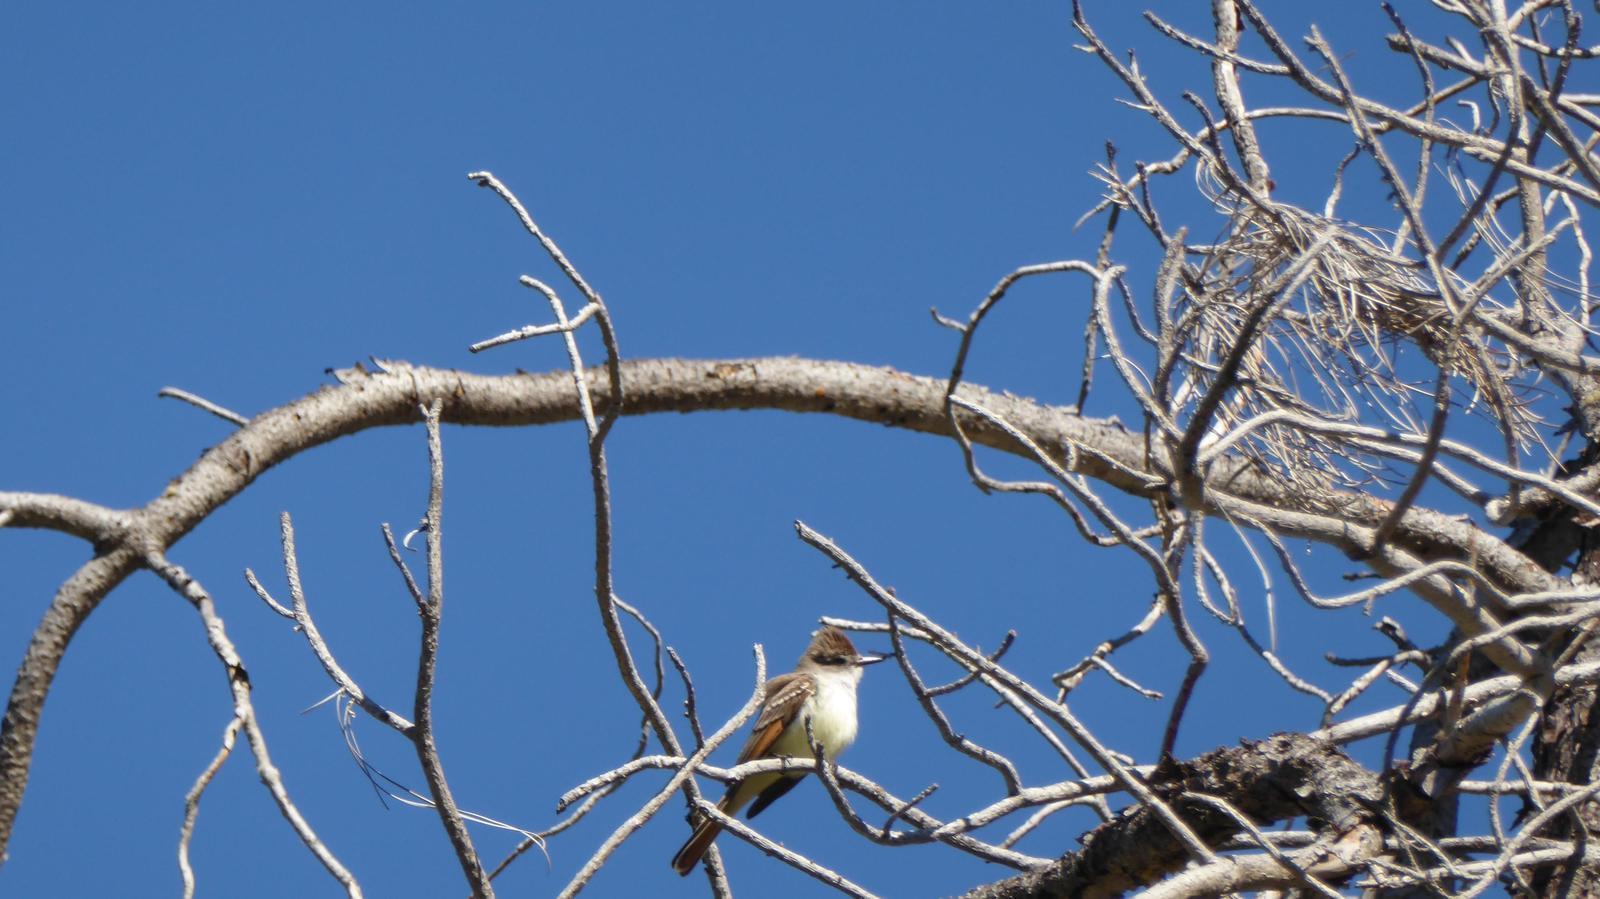 Ash-throated Flycatcher Photo by Daliel Leite